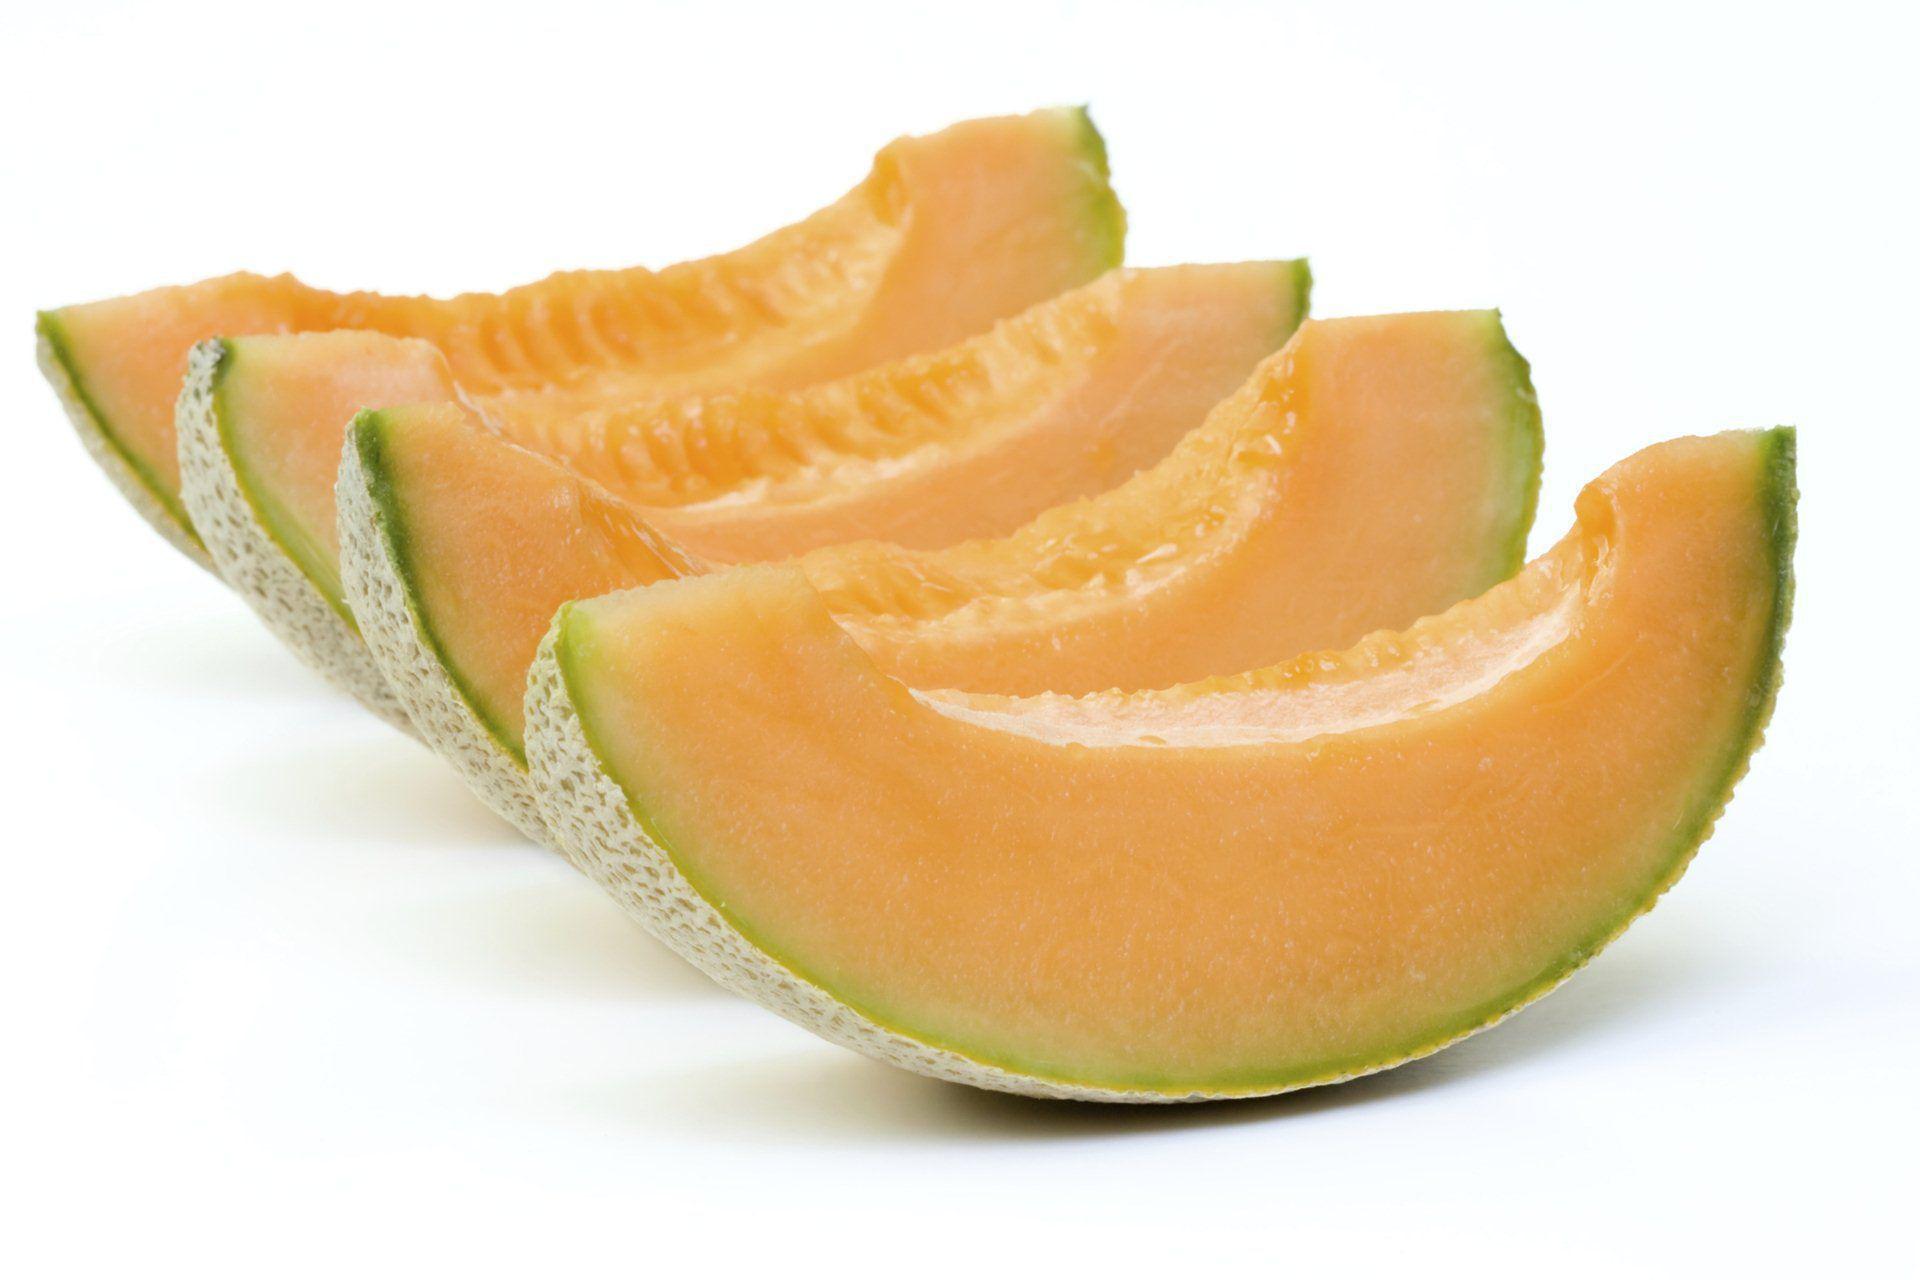 Melon Hd Wallpaper